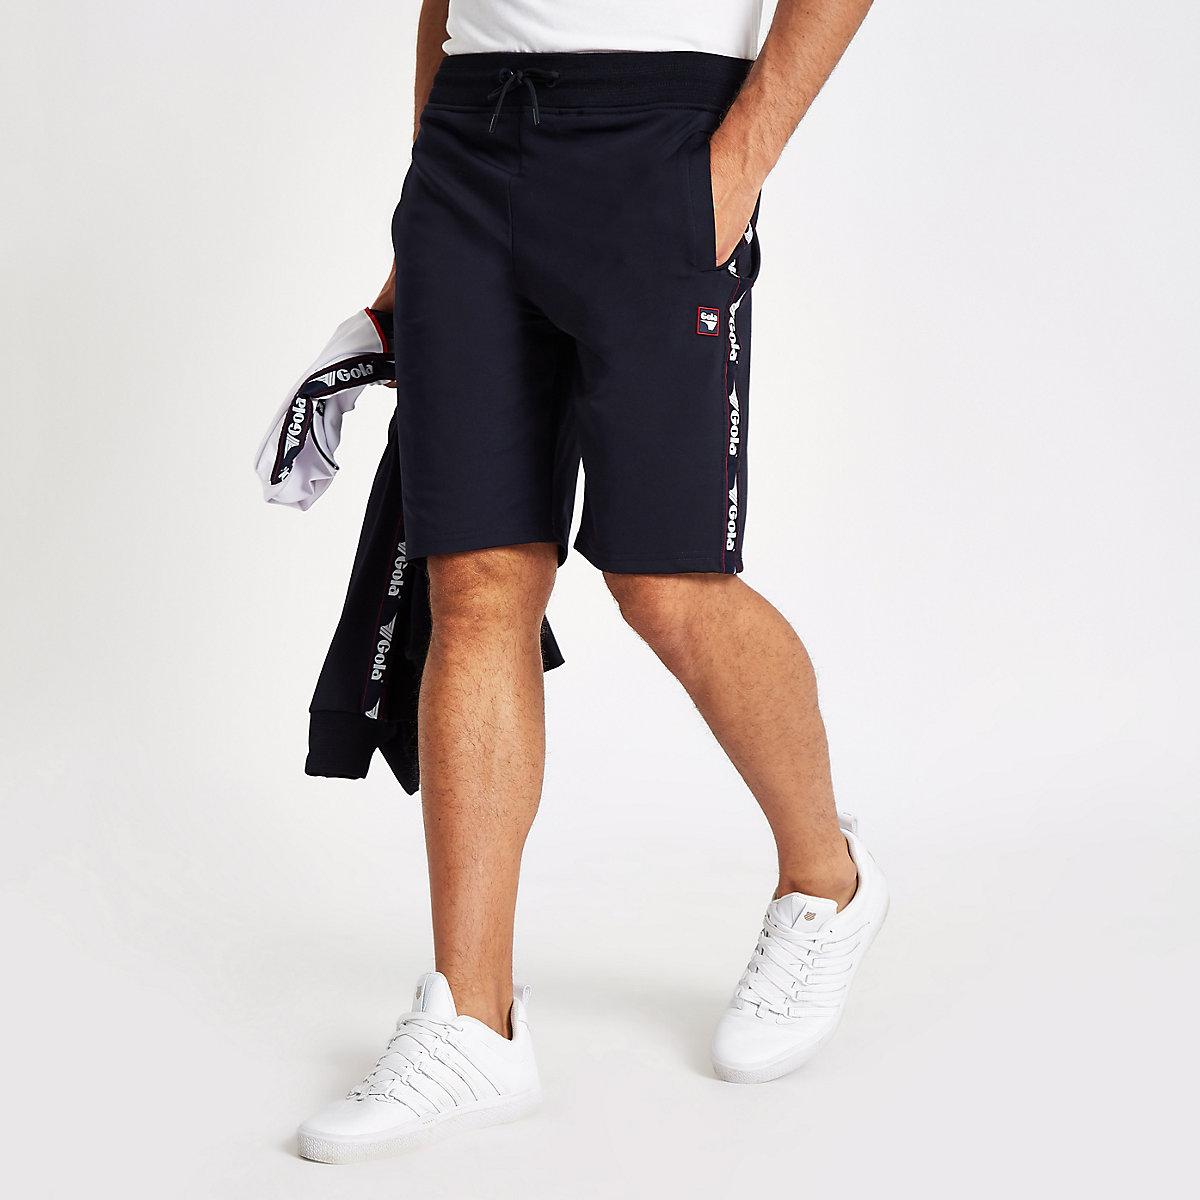 Gola navy tape shorts